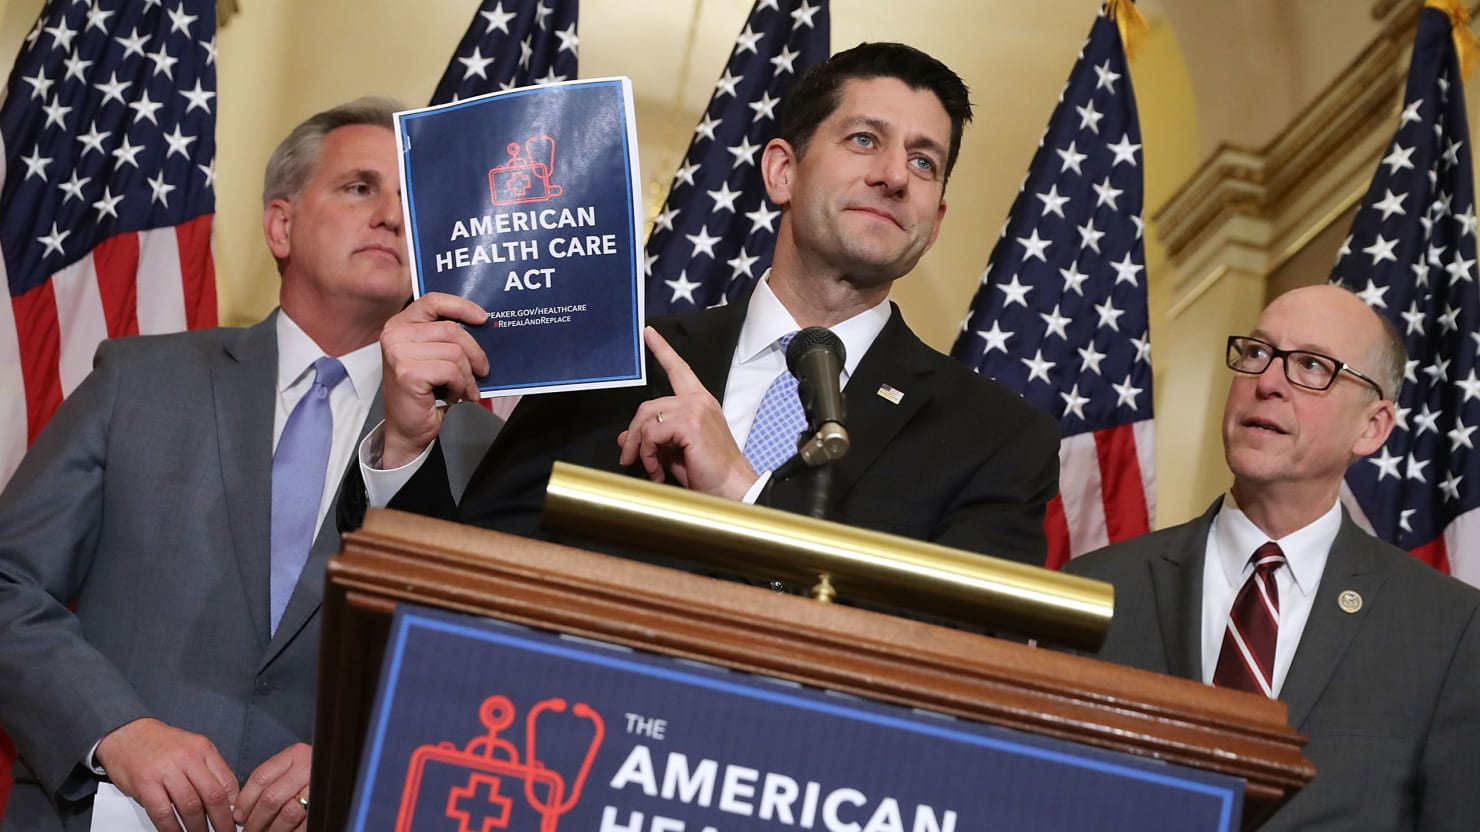 Health Care Reform - Magazine cover